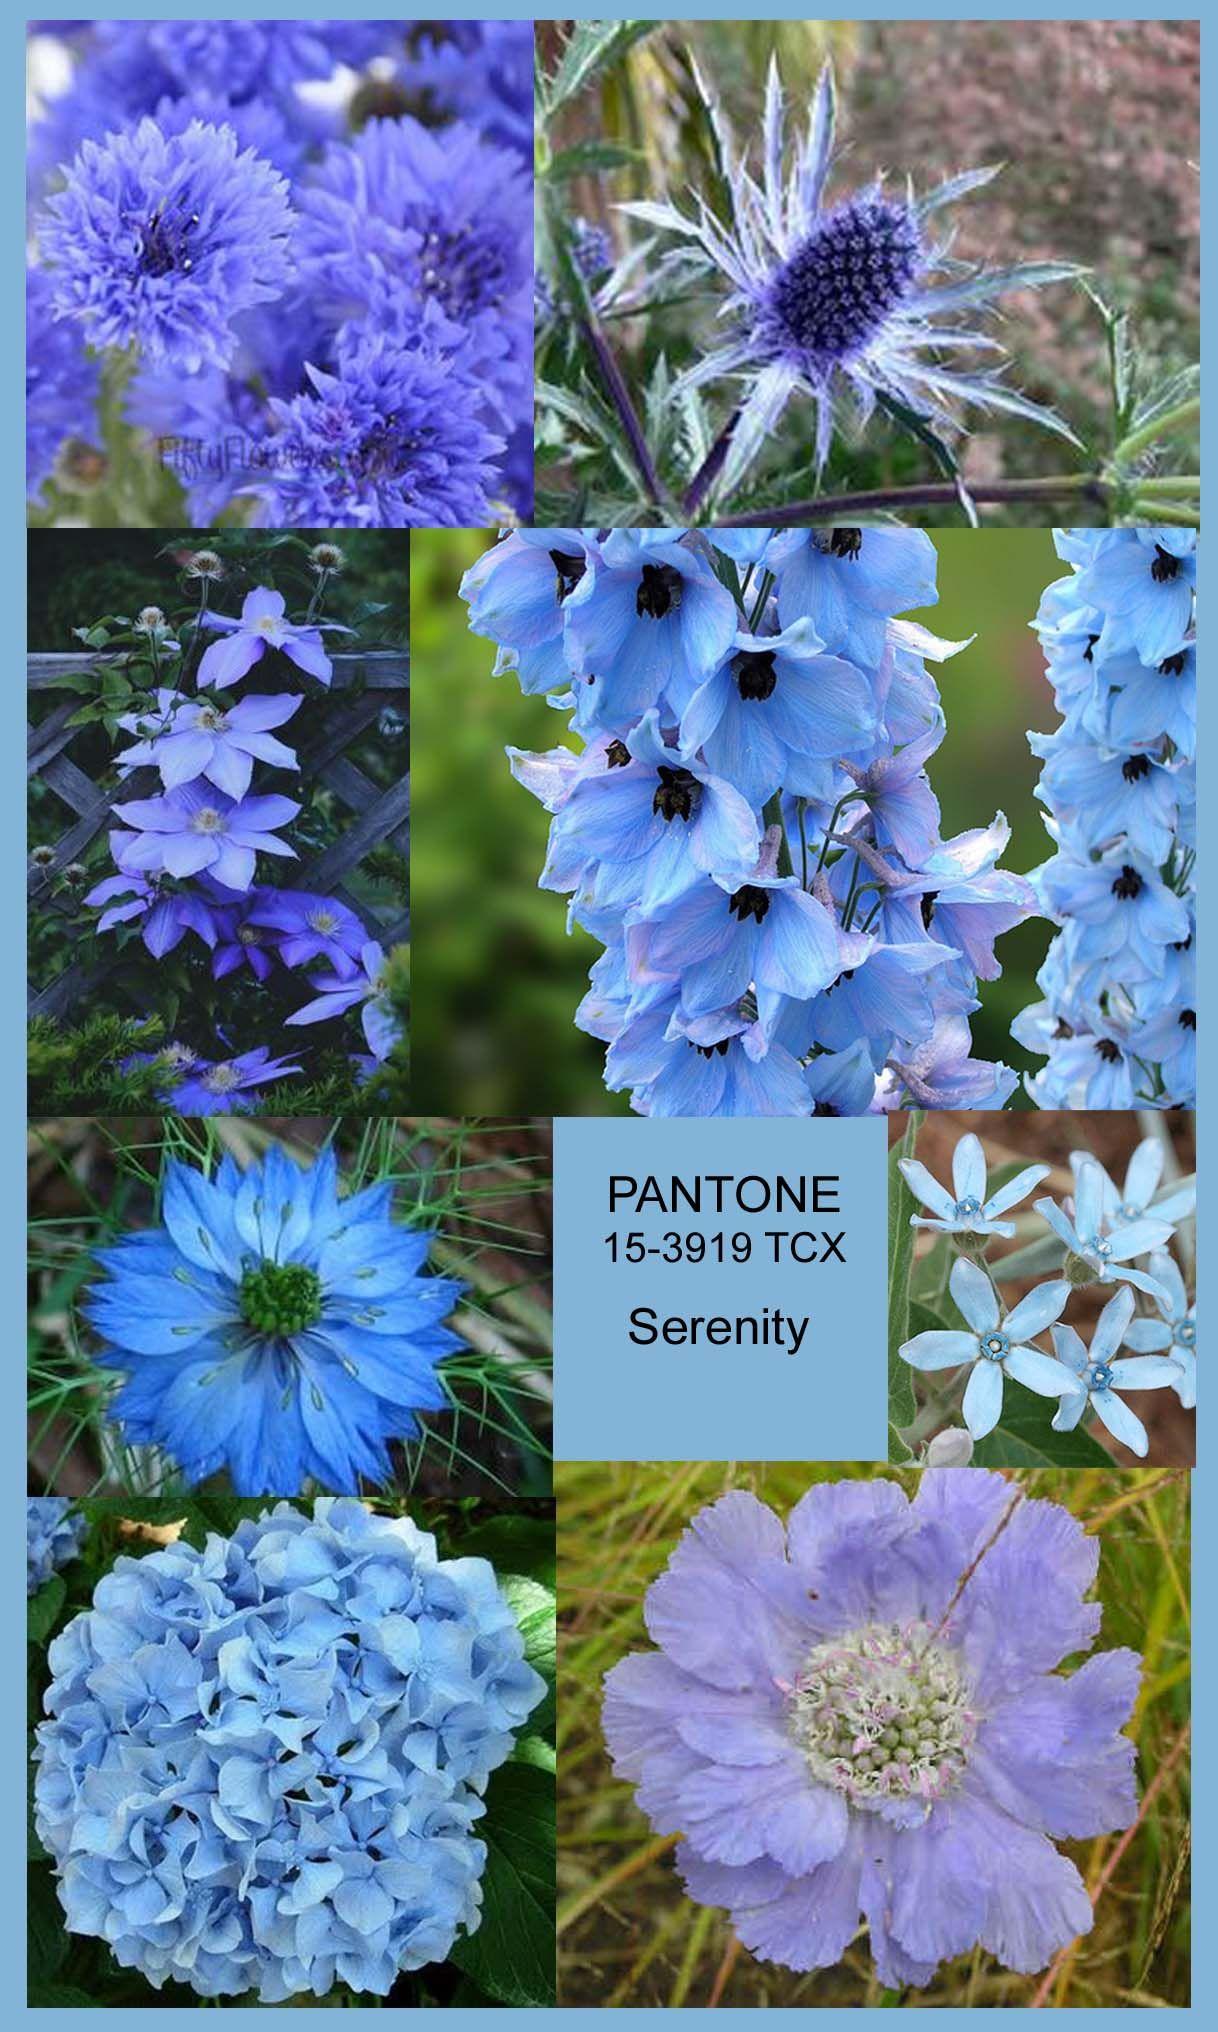 Serenity blue flowers from top left corner clockwise